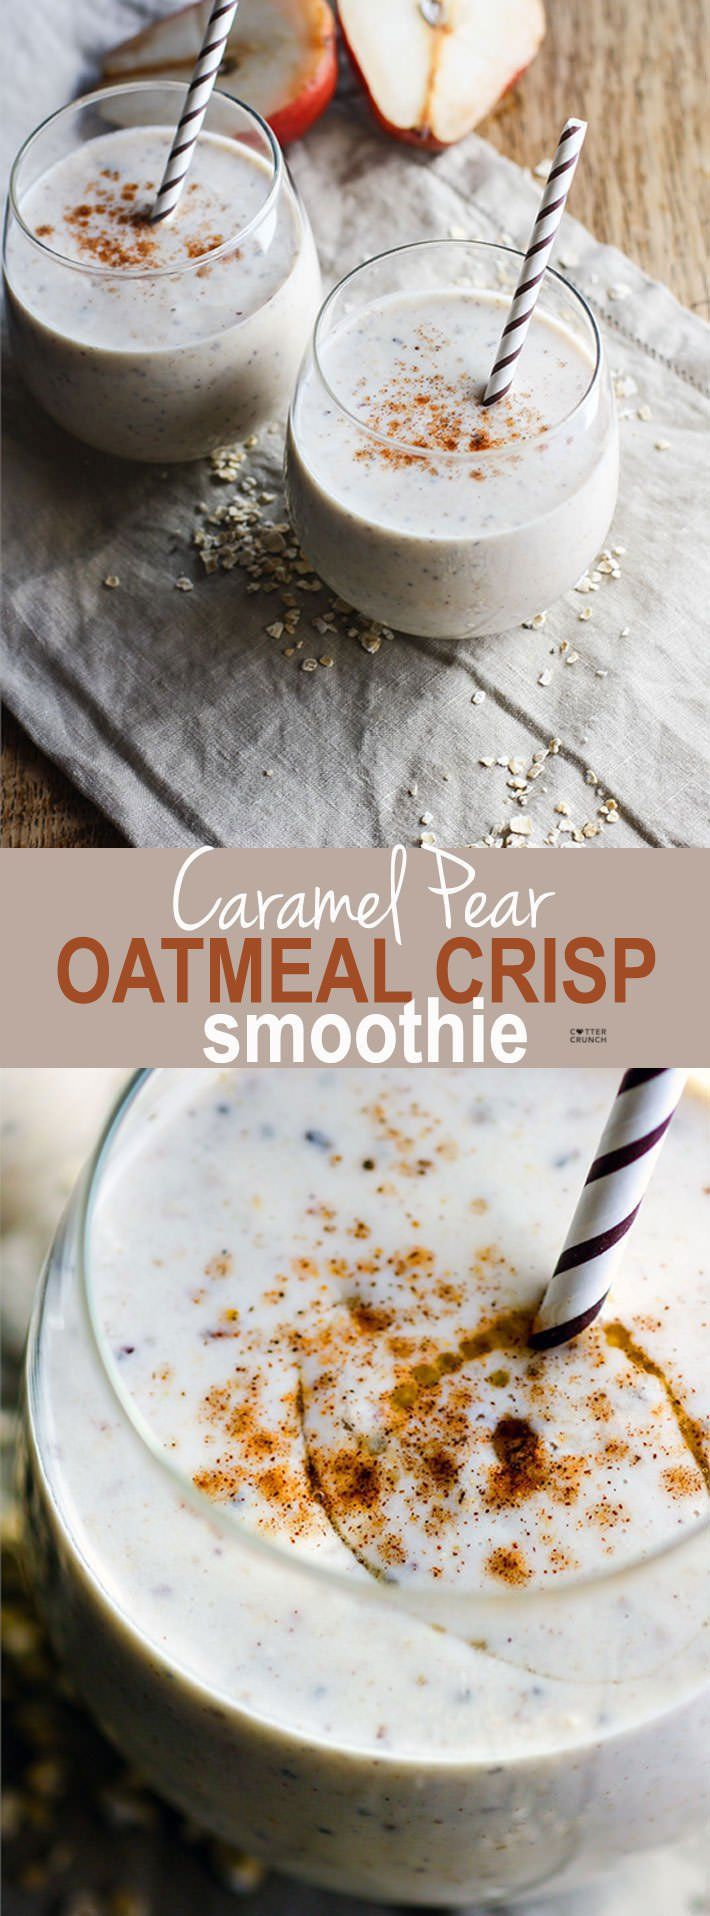 Creamy Caramel Pear Oatmeal Crisp Smoothie {Gluten Free}